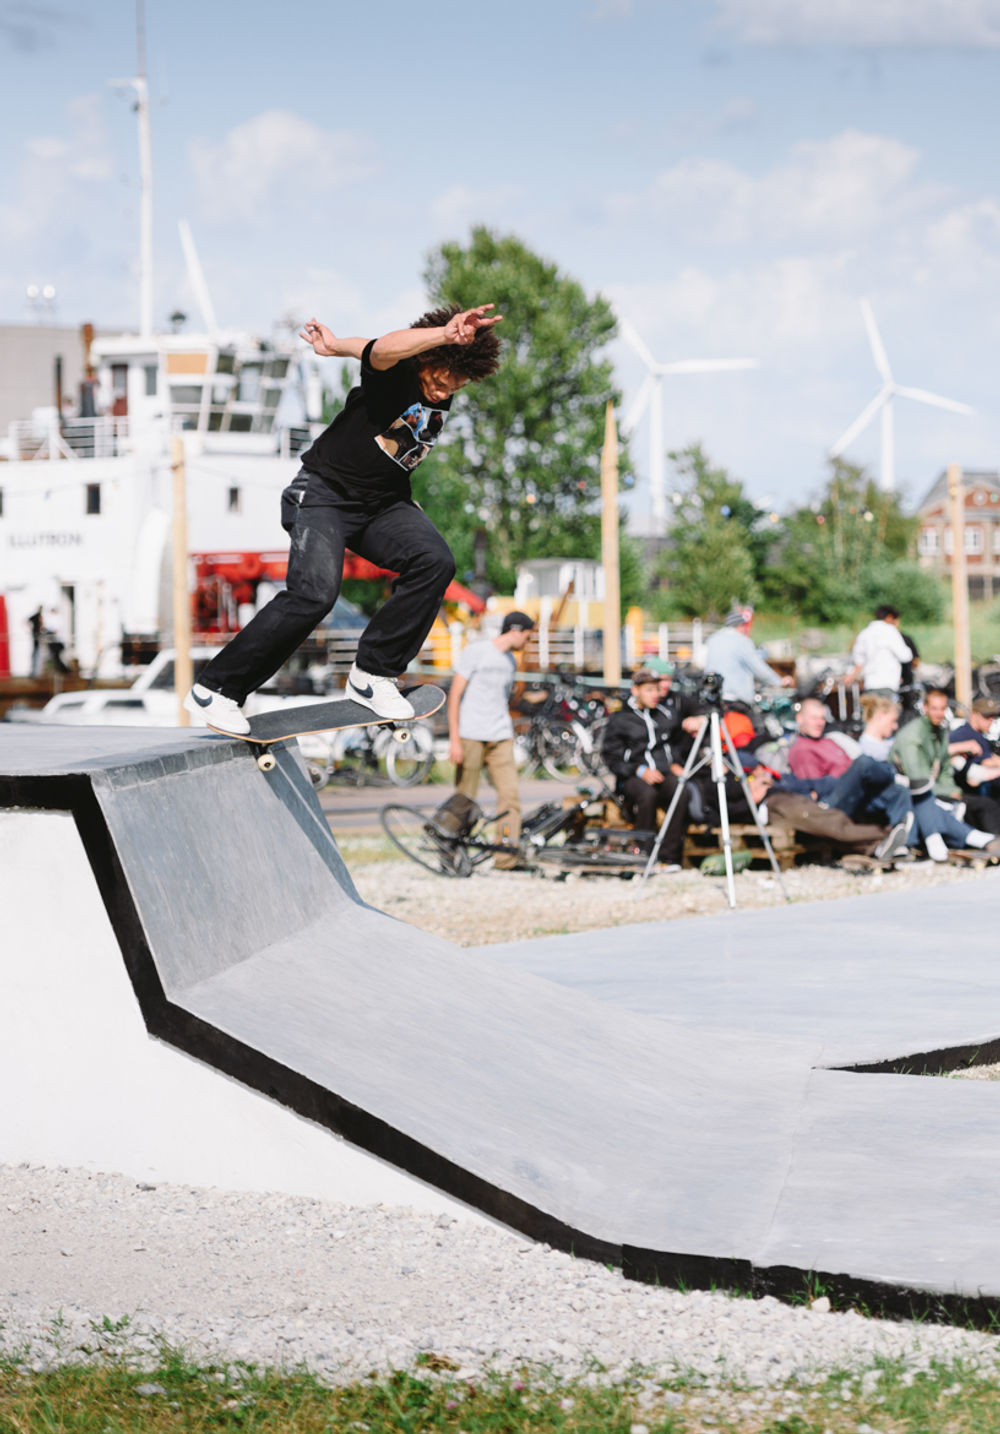 _IHC5732e-Kevin-Bradley-Crooked-Nike-SB-Copenhagen-Open-Day-4-July-2015-Photographer-Maksim-Kalanep